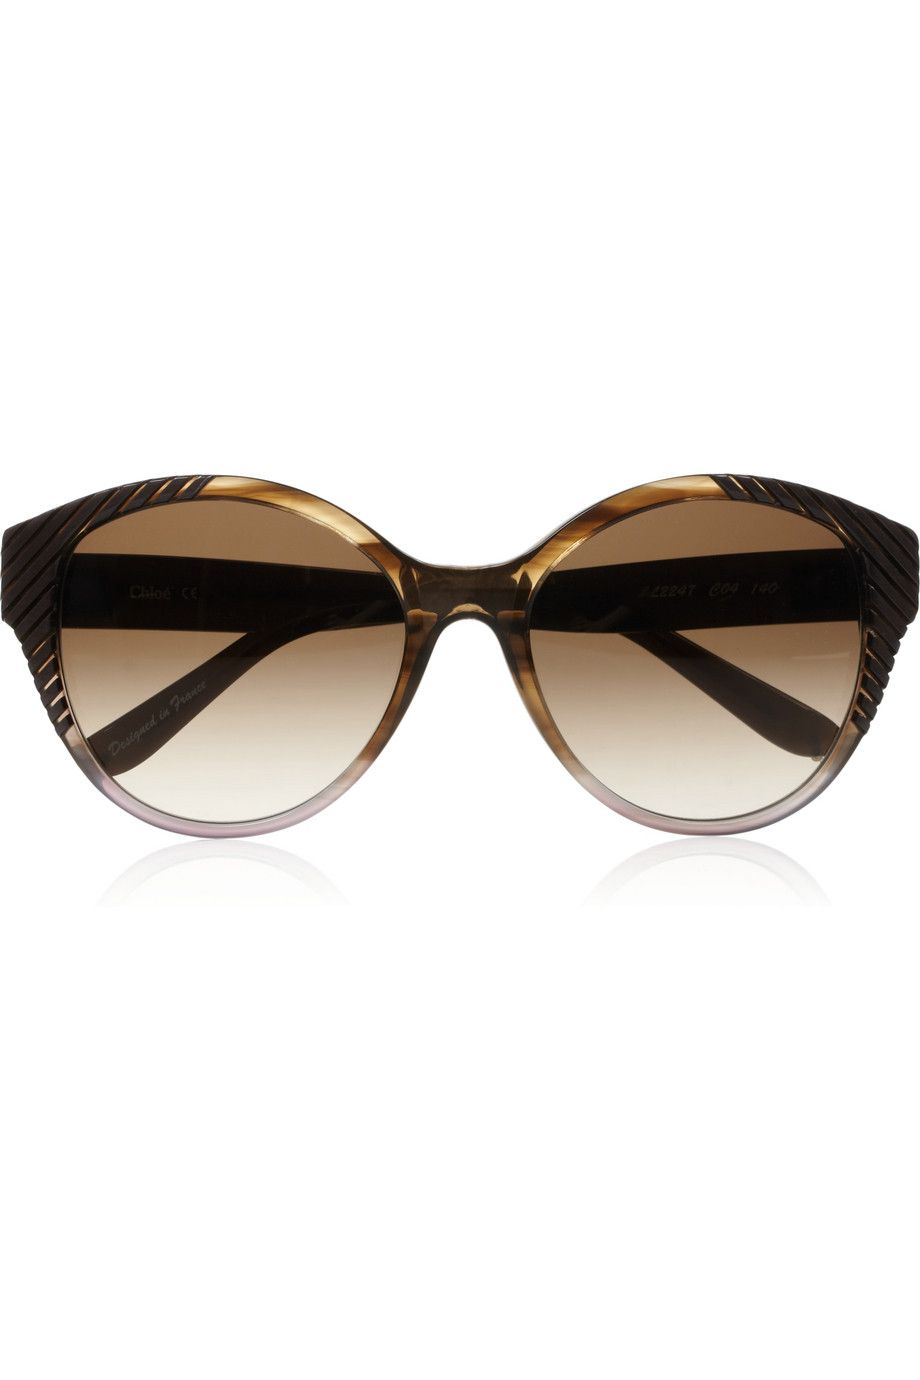 ae915c1e Cat eye acetate sunglasses by Chloé #Fashion #Accessory ...